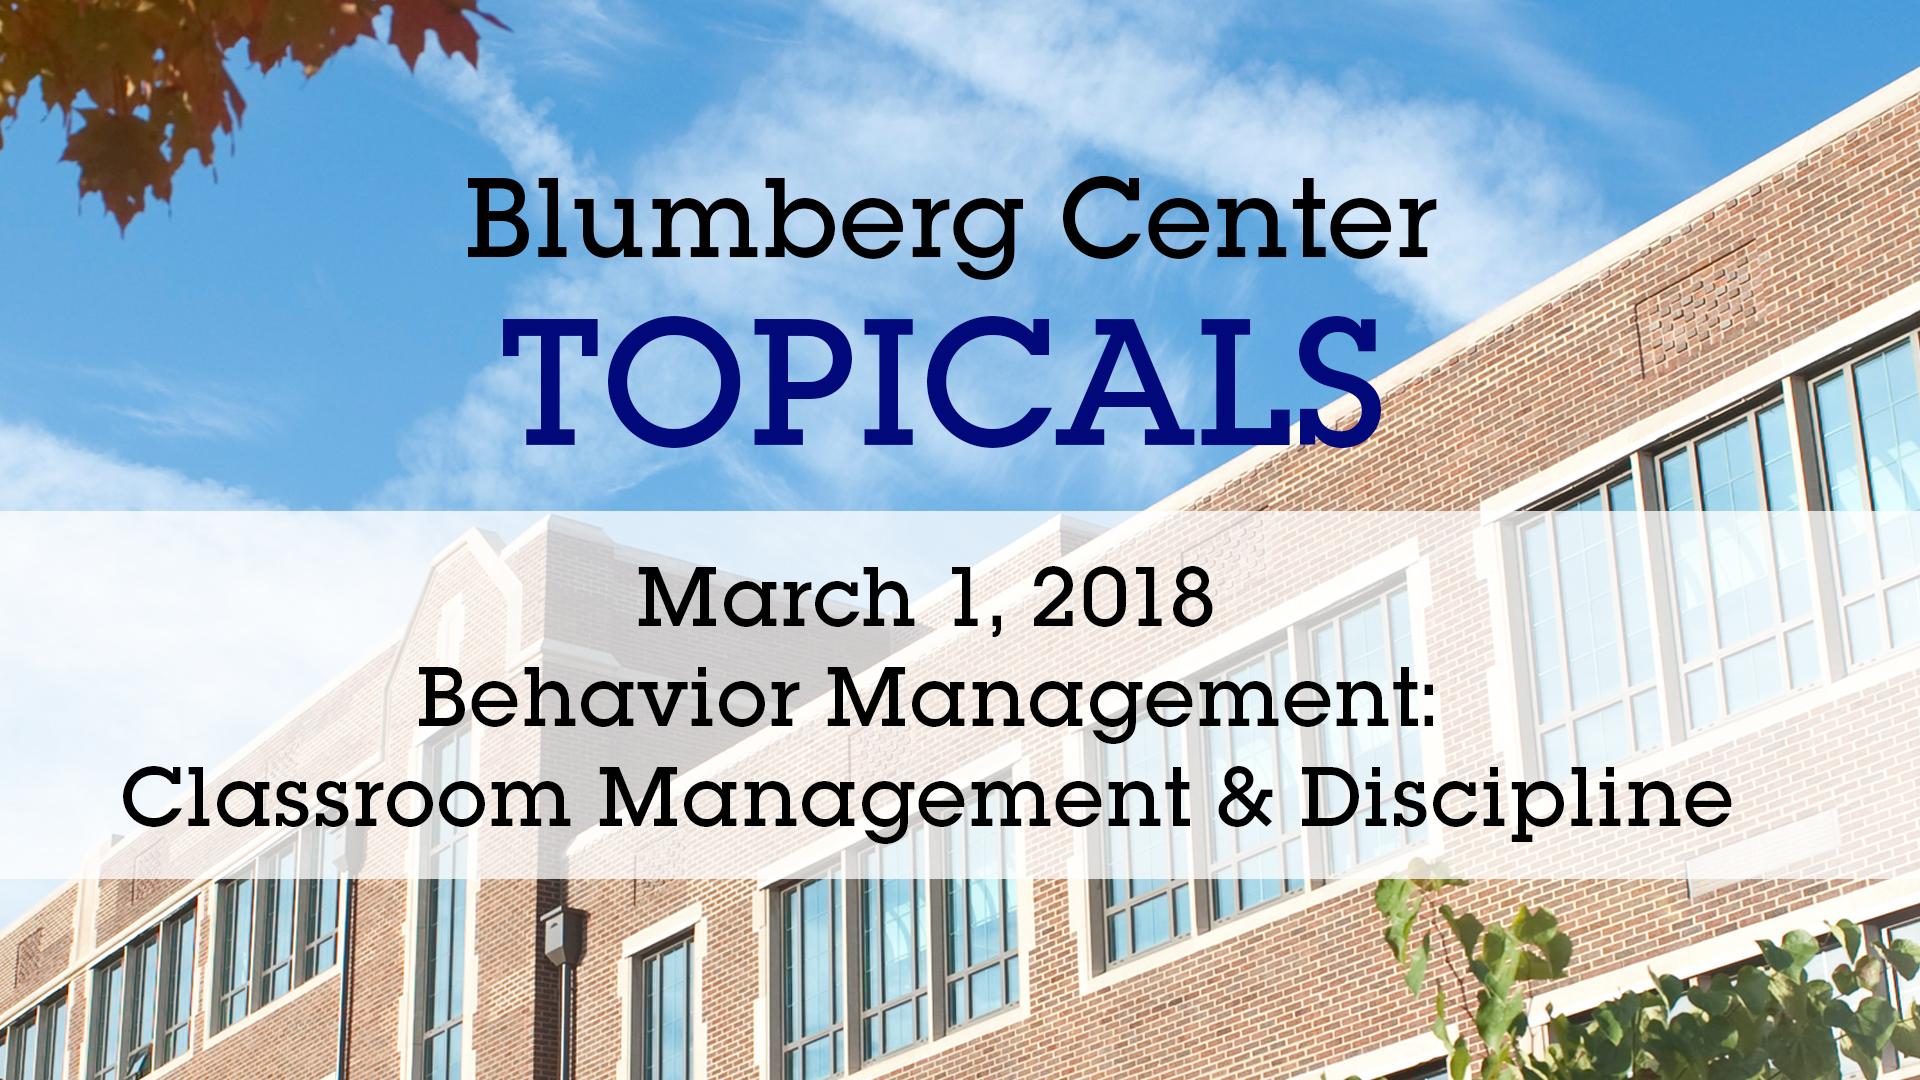 Blumberg Center Topicals Behavior Management